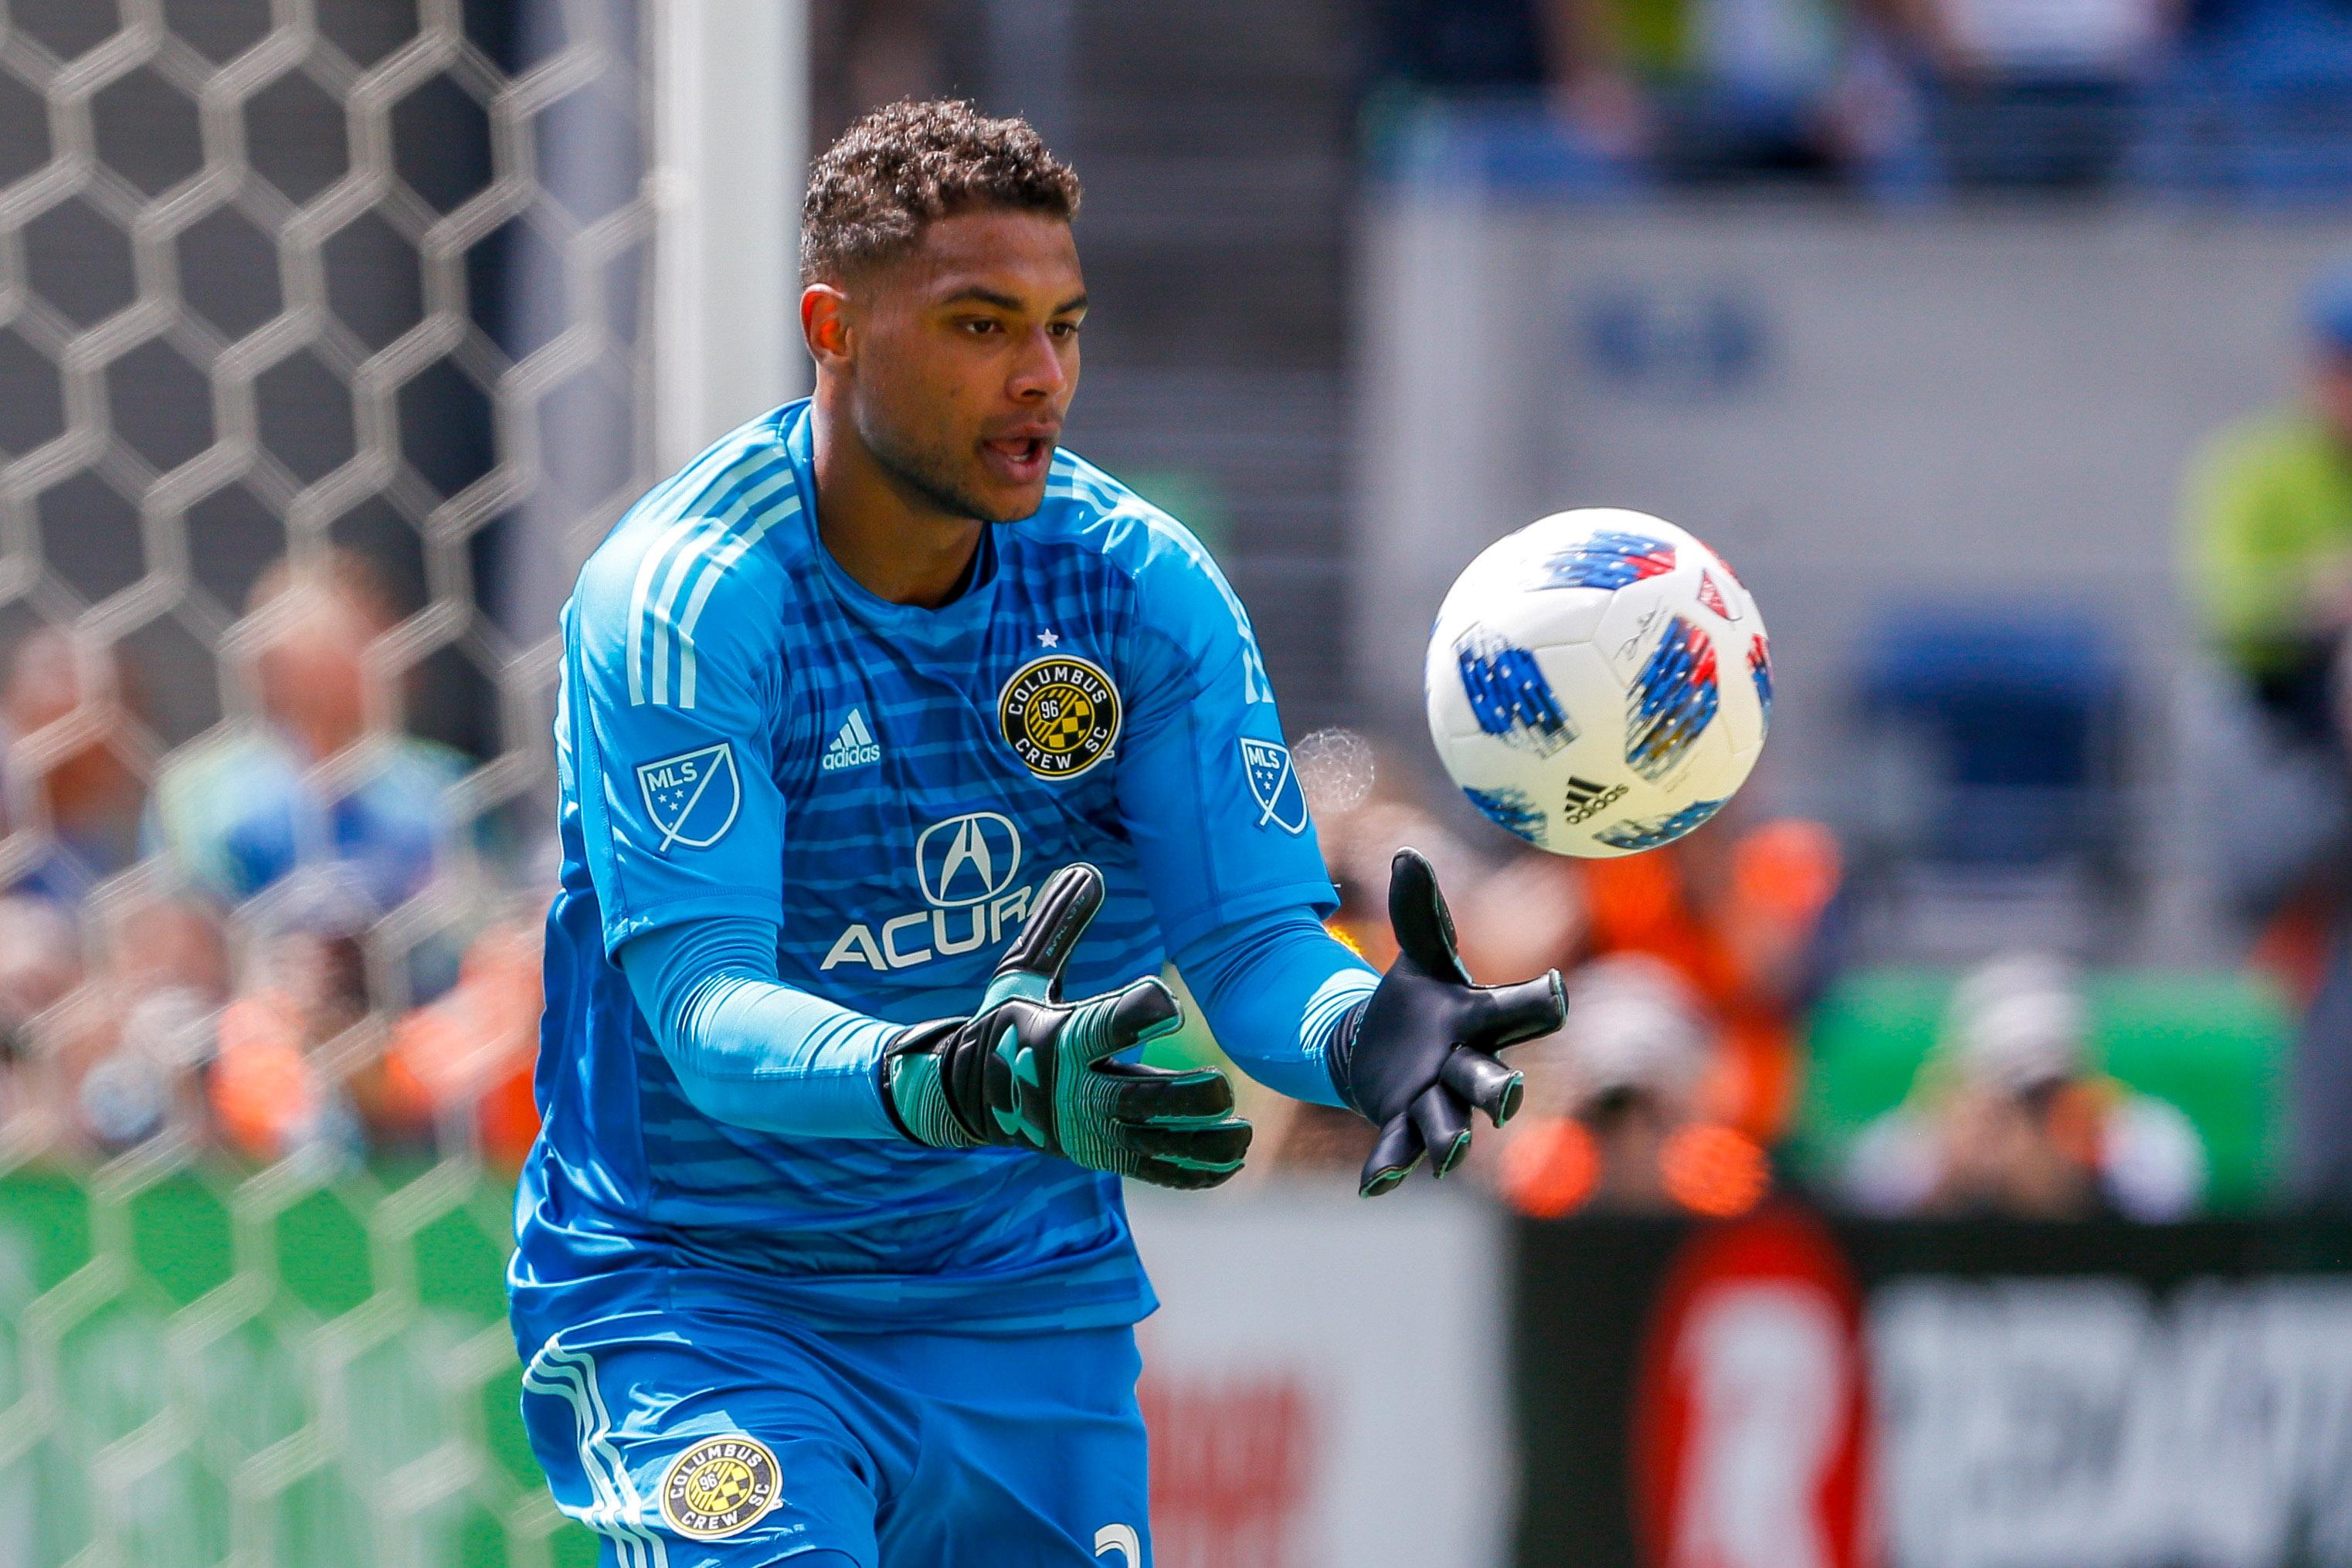 Report: English Championship club bid for Zack Steffen - Stars and